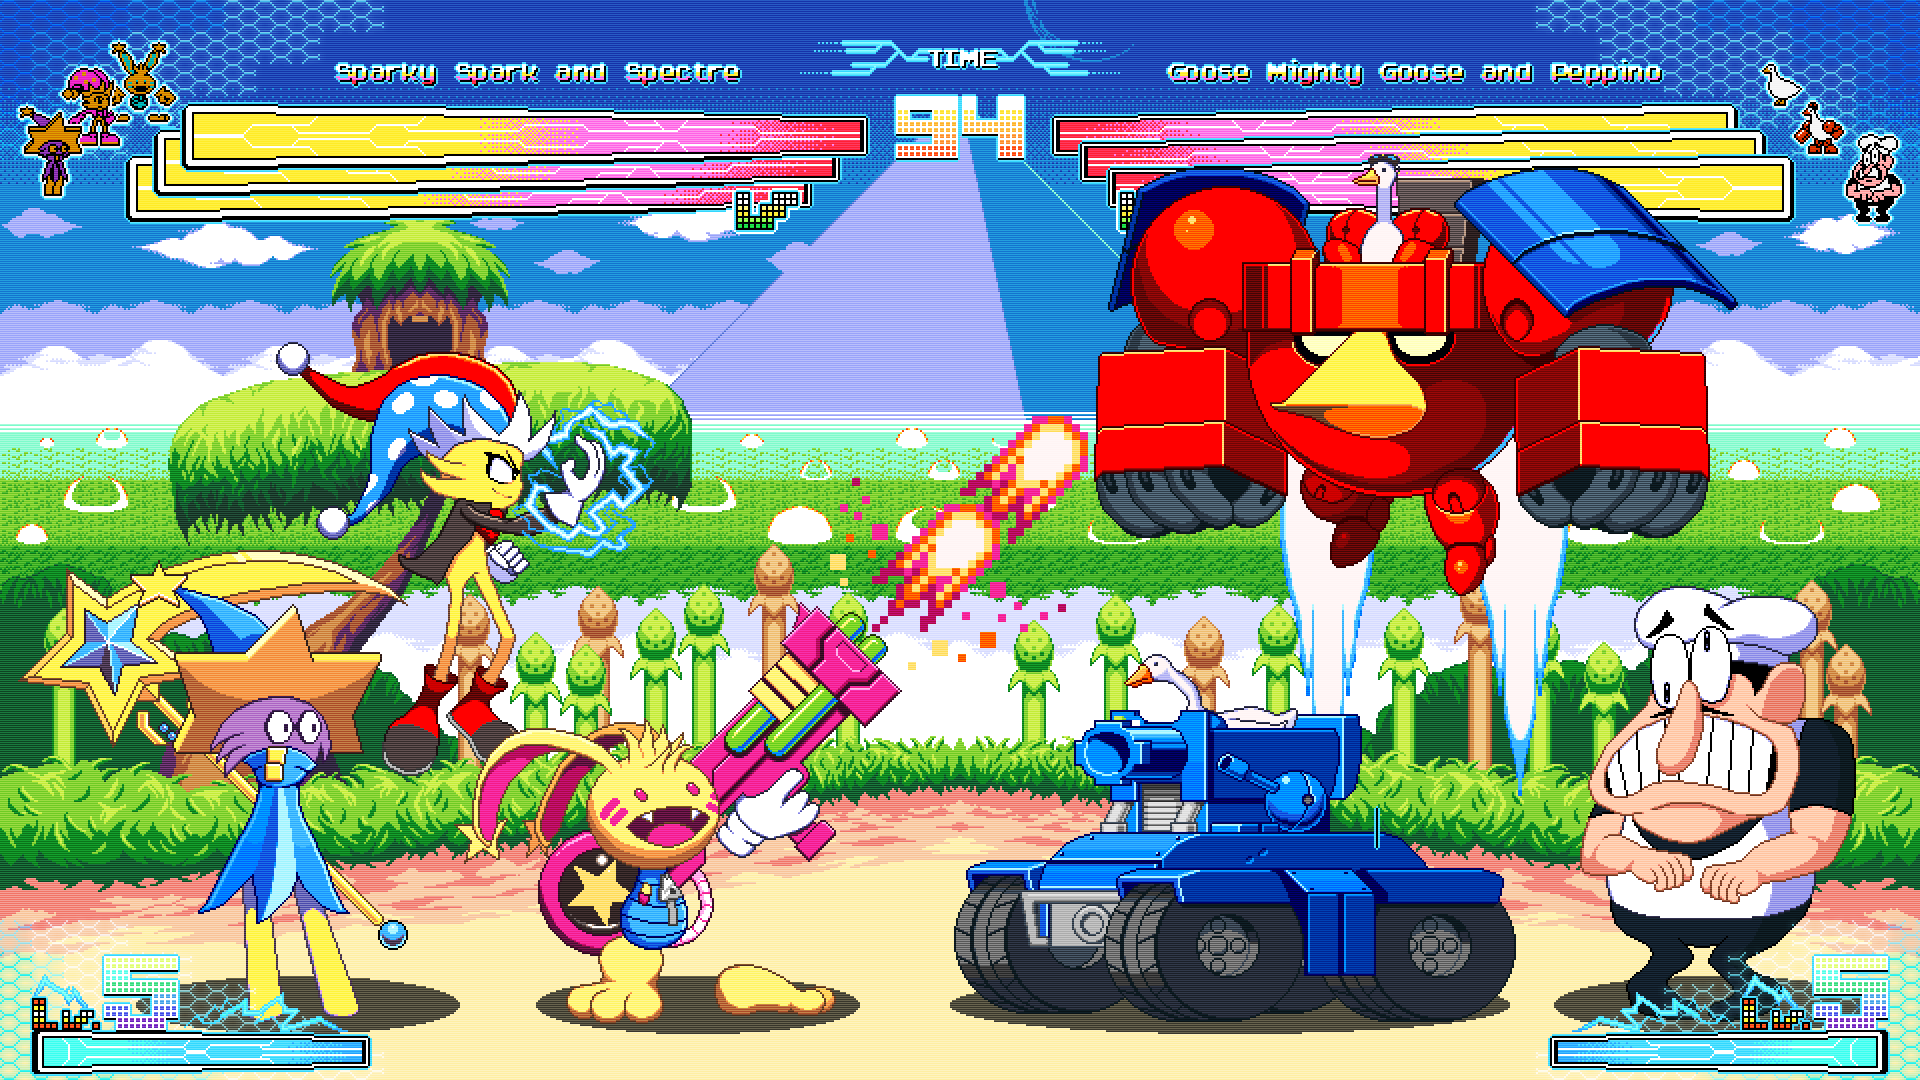 Team Spark vs. Team Goose